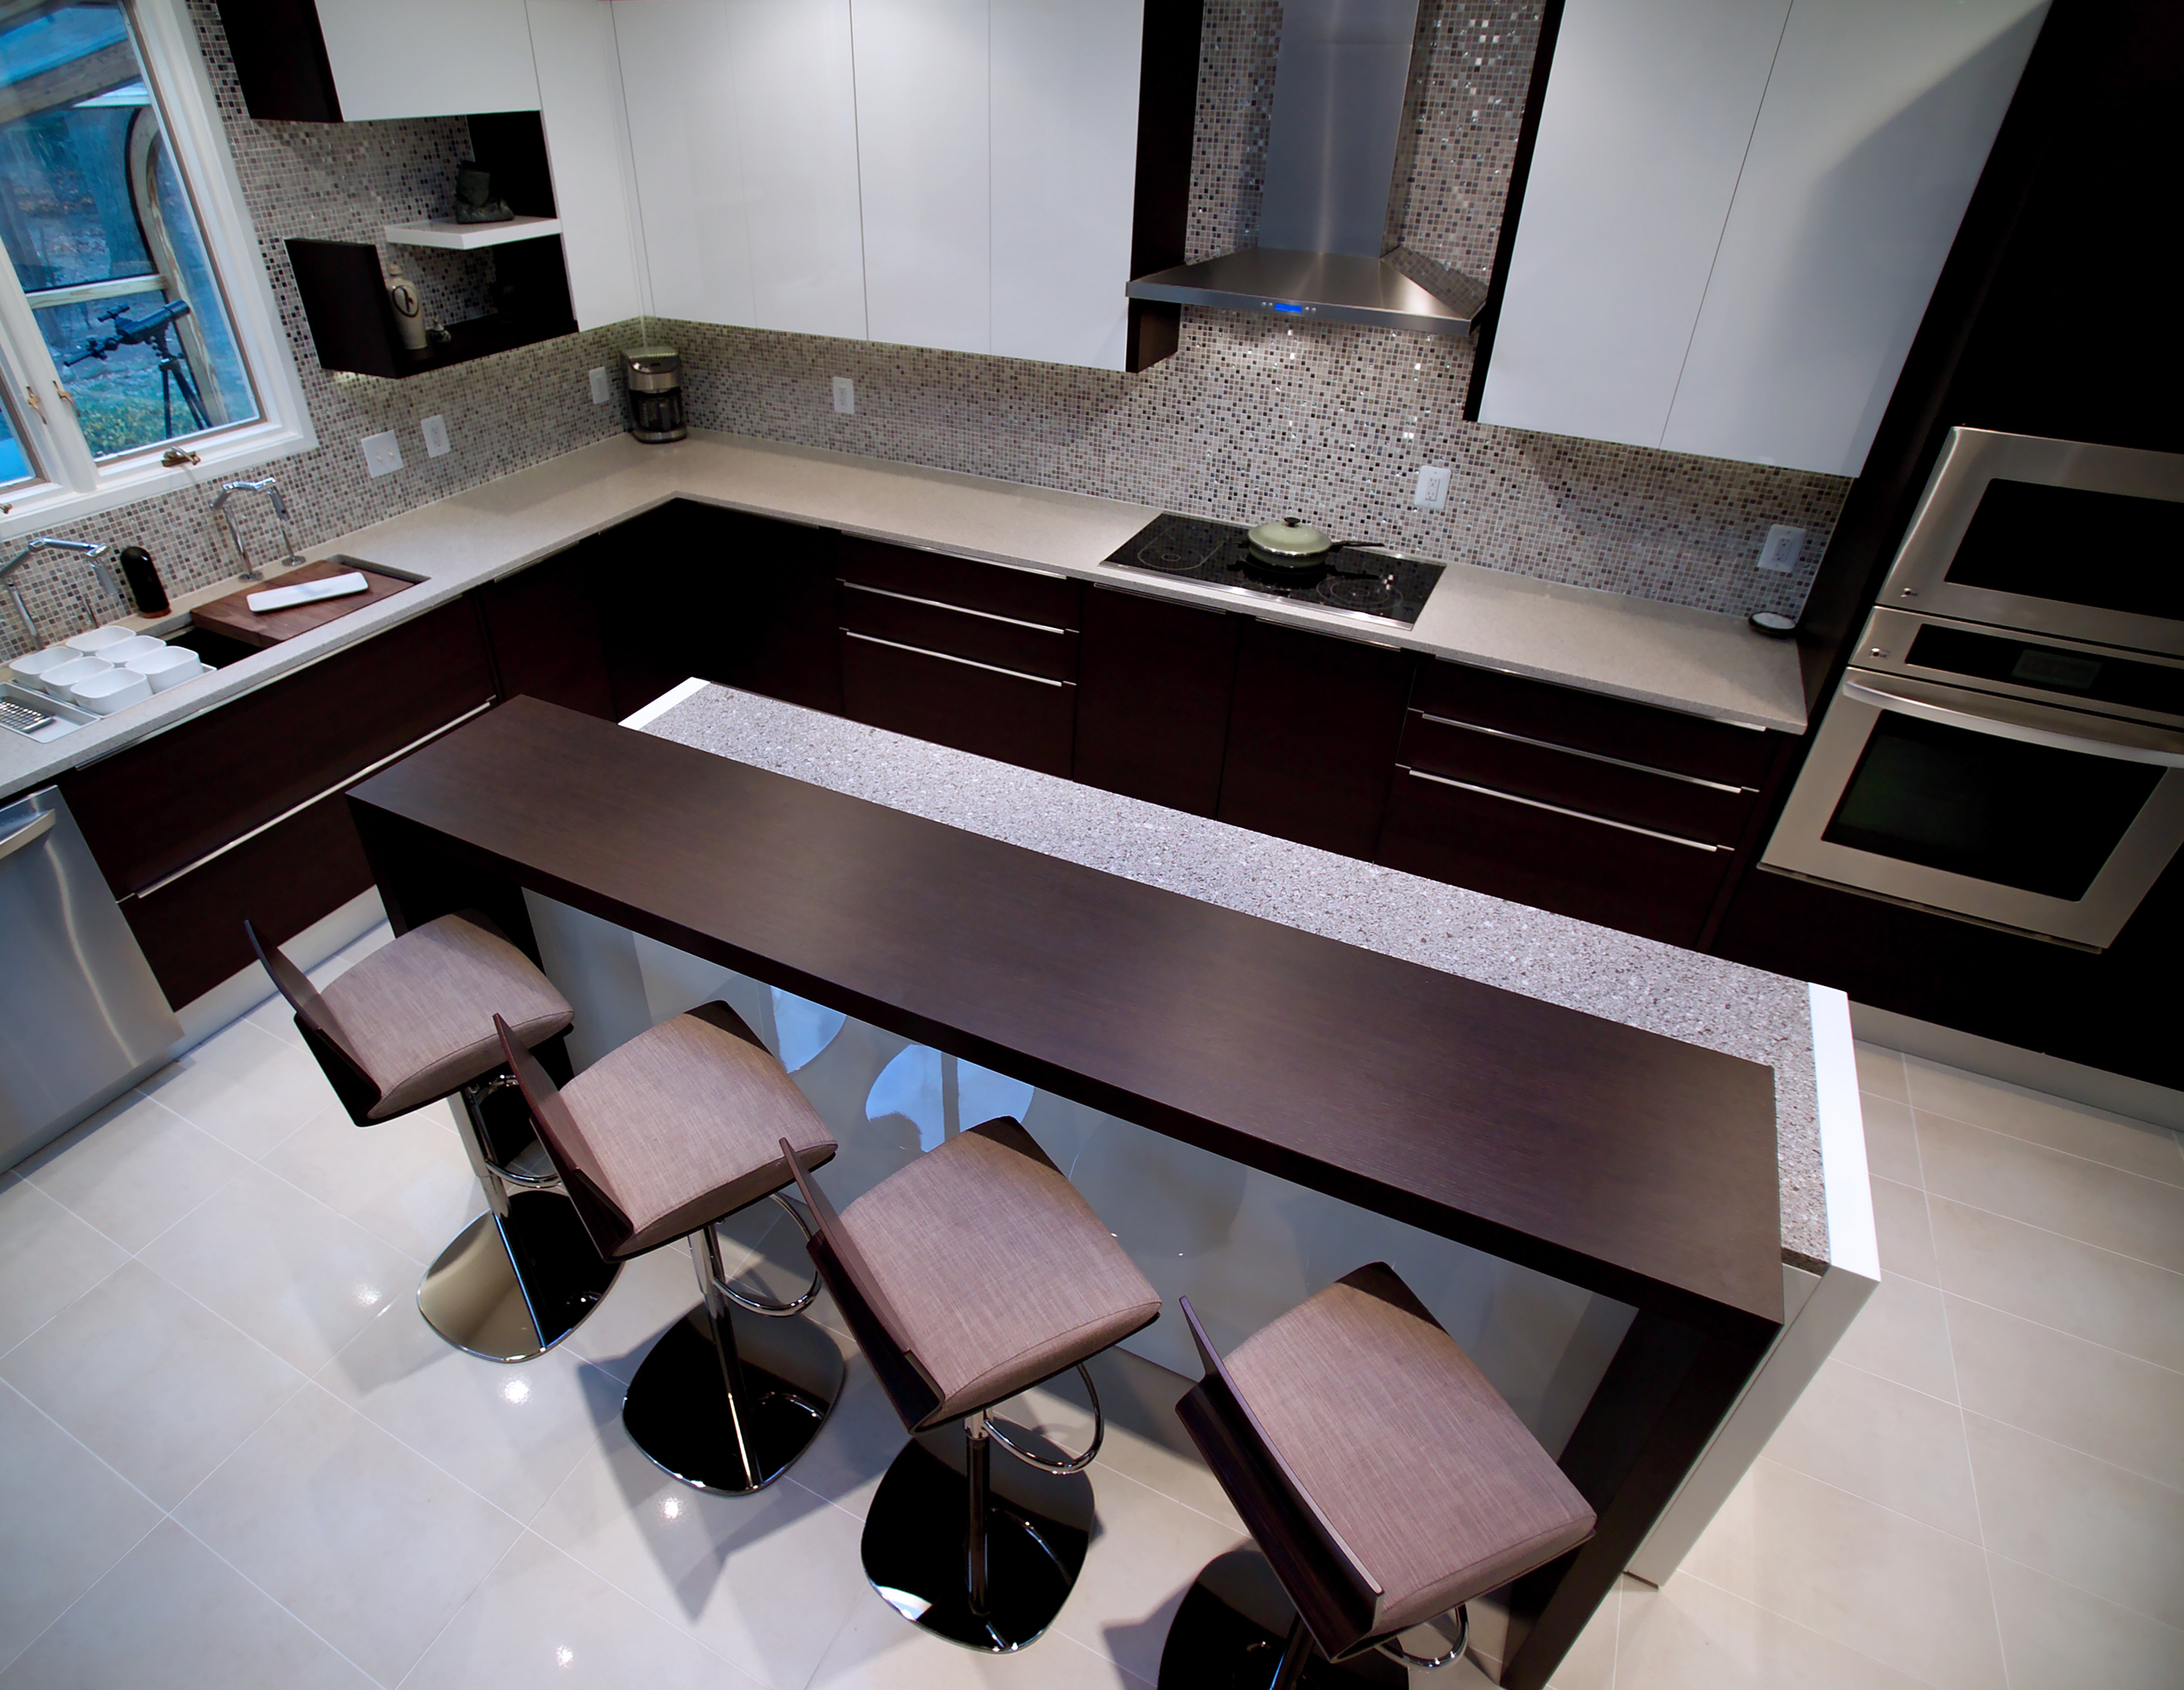 Kitchen 4 - Overhead Angle.jpg